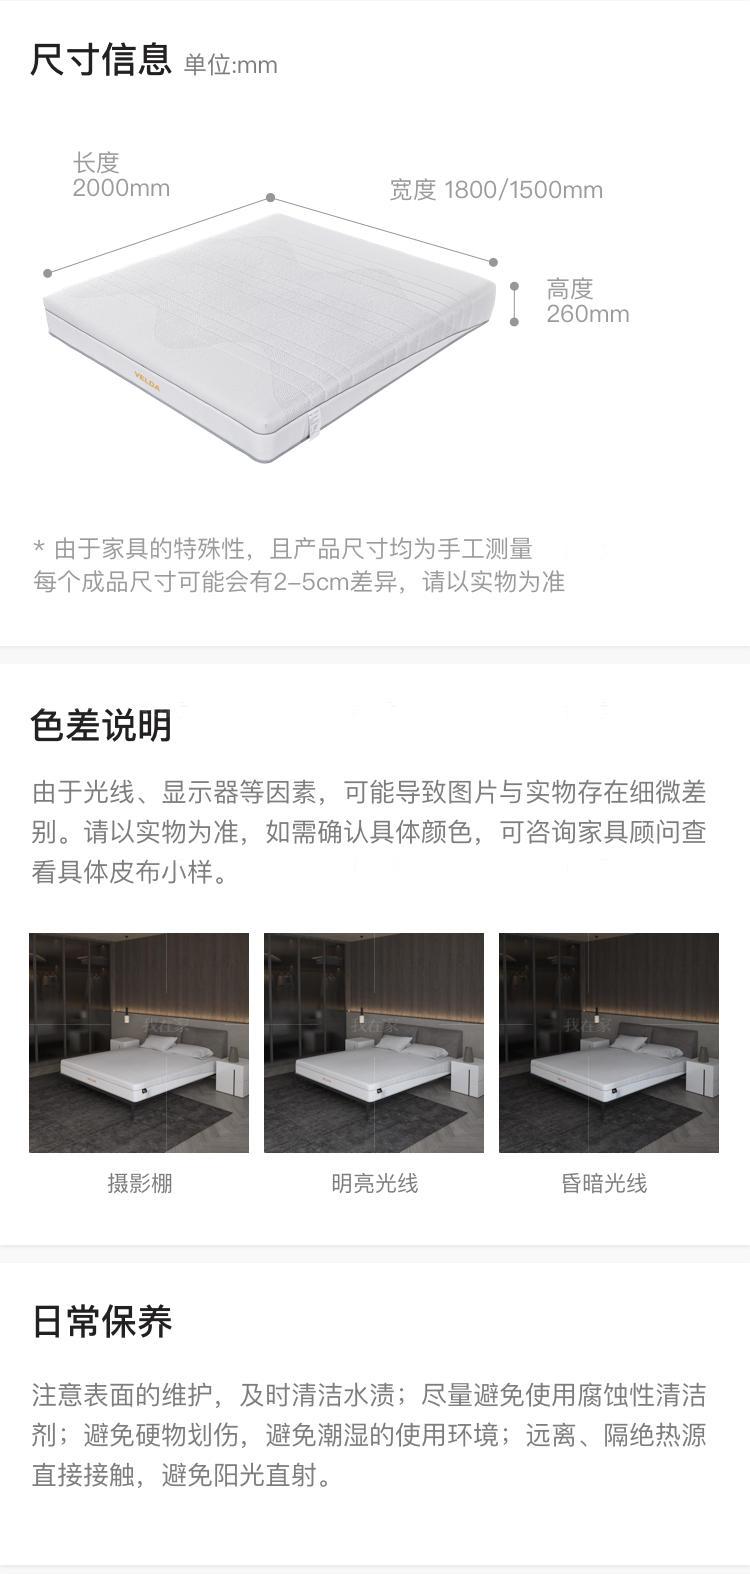 VELDA系列布林根乳胶床垫的详细介绍